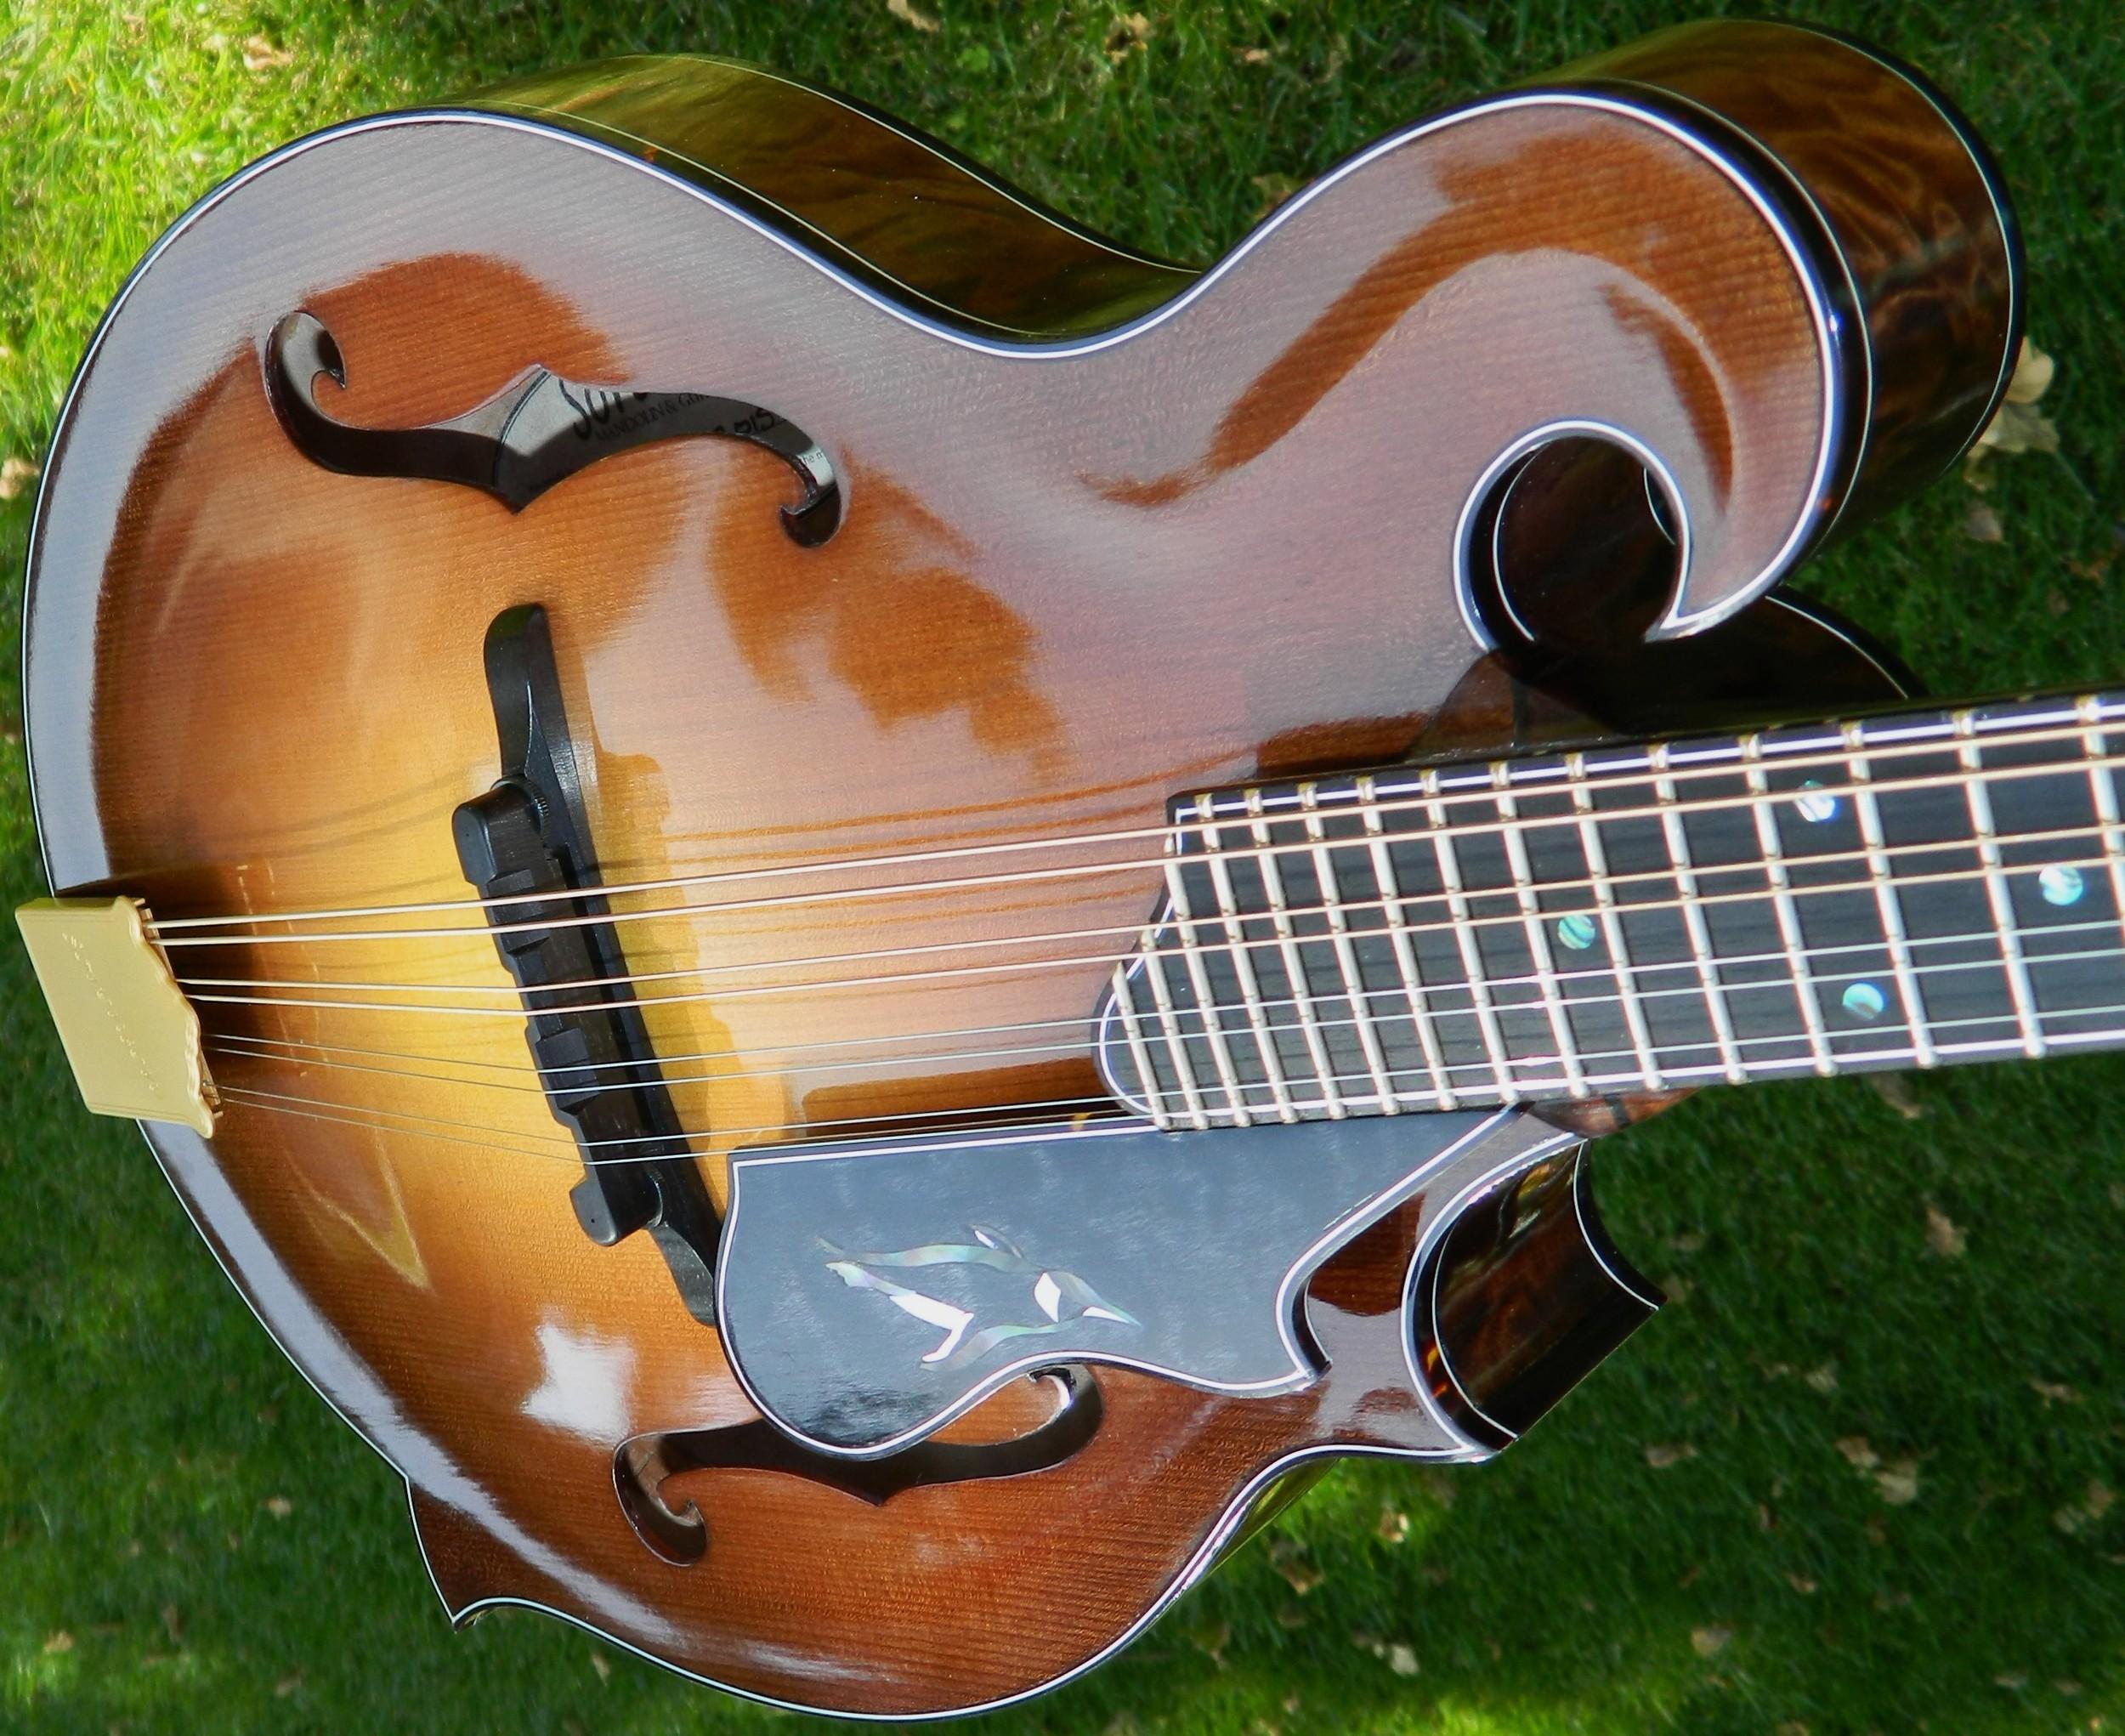 Pacifica mandolin, photo by Steve sorensen.